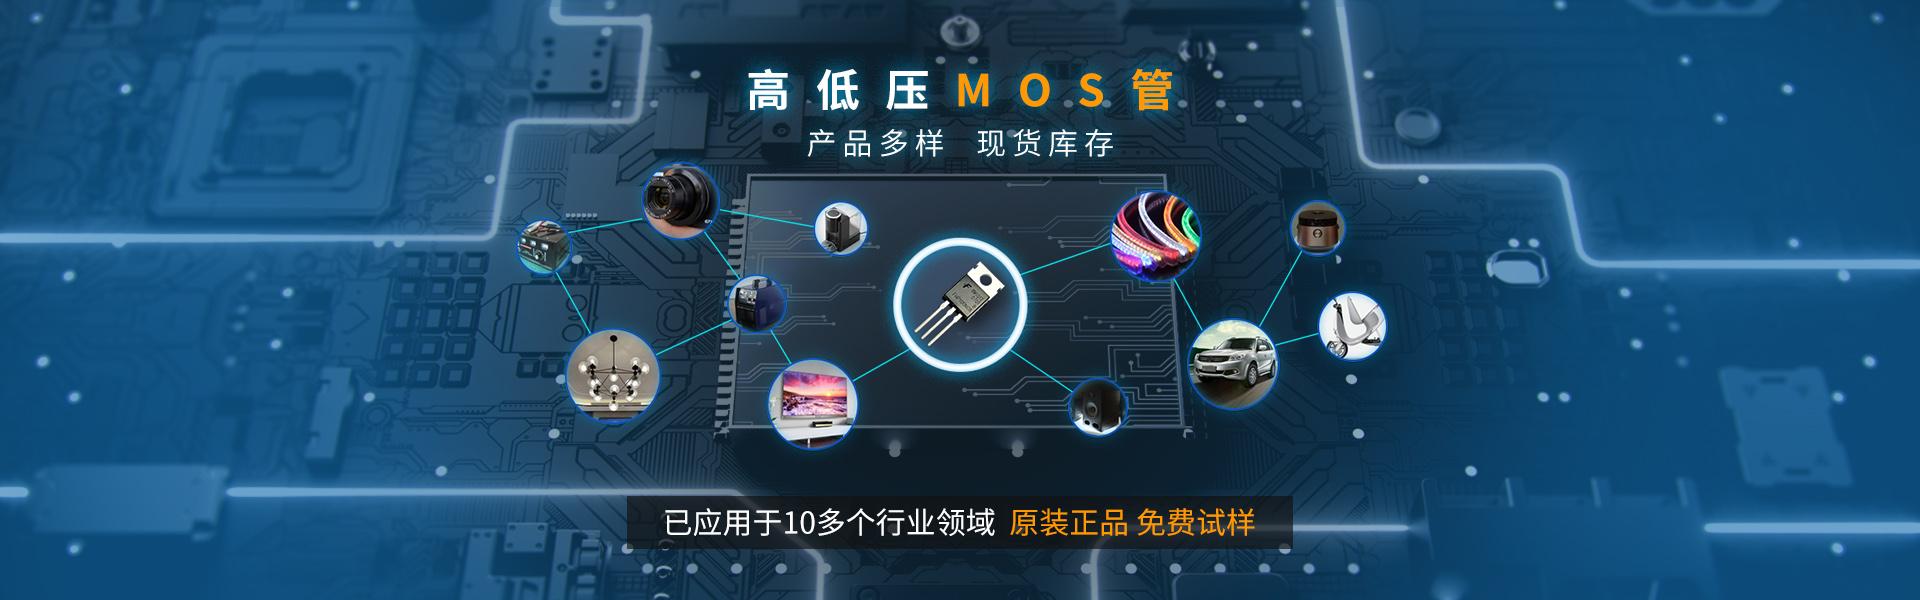 18luck高低压mosguan产品多样,yi应用10多个行业